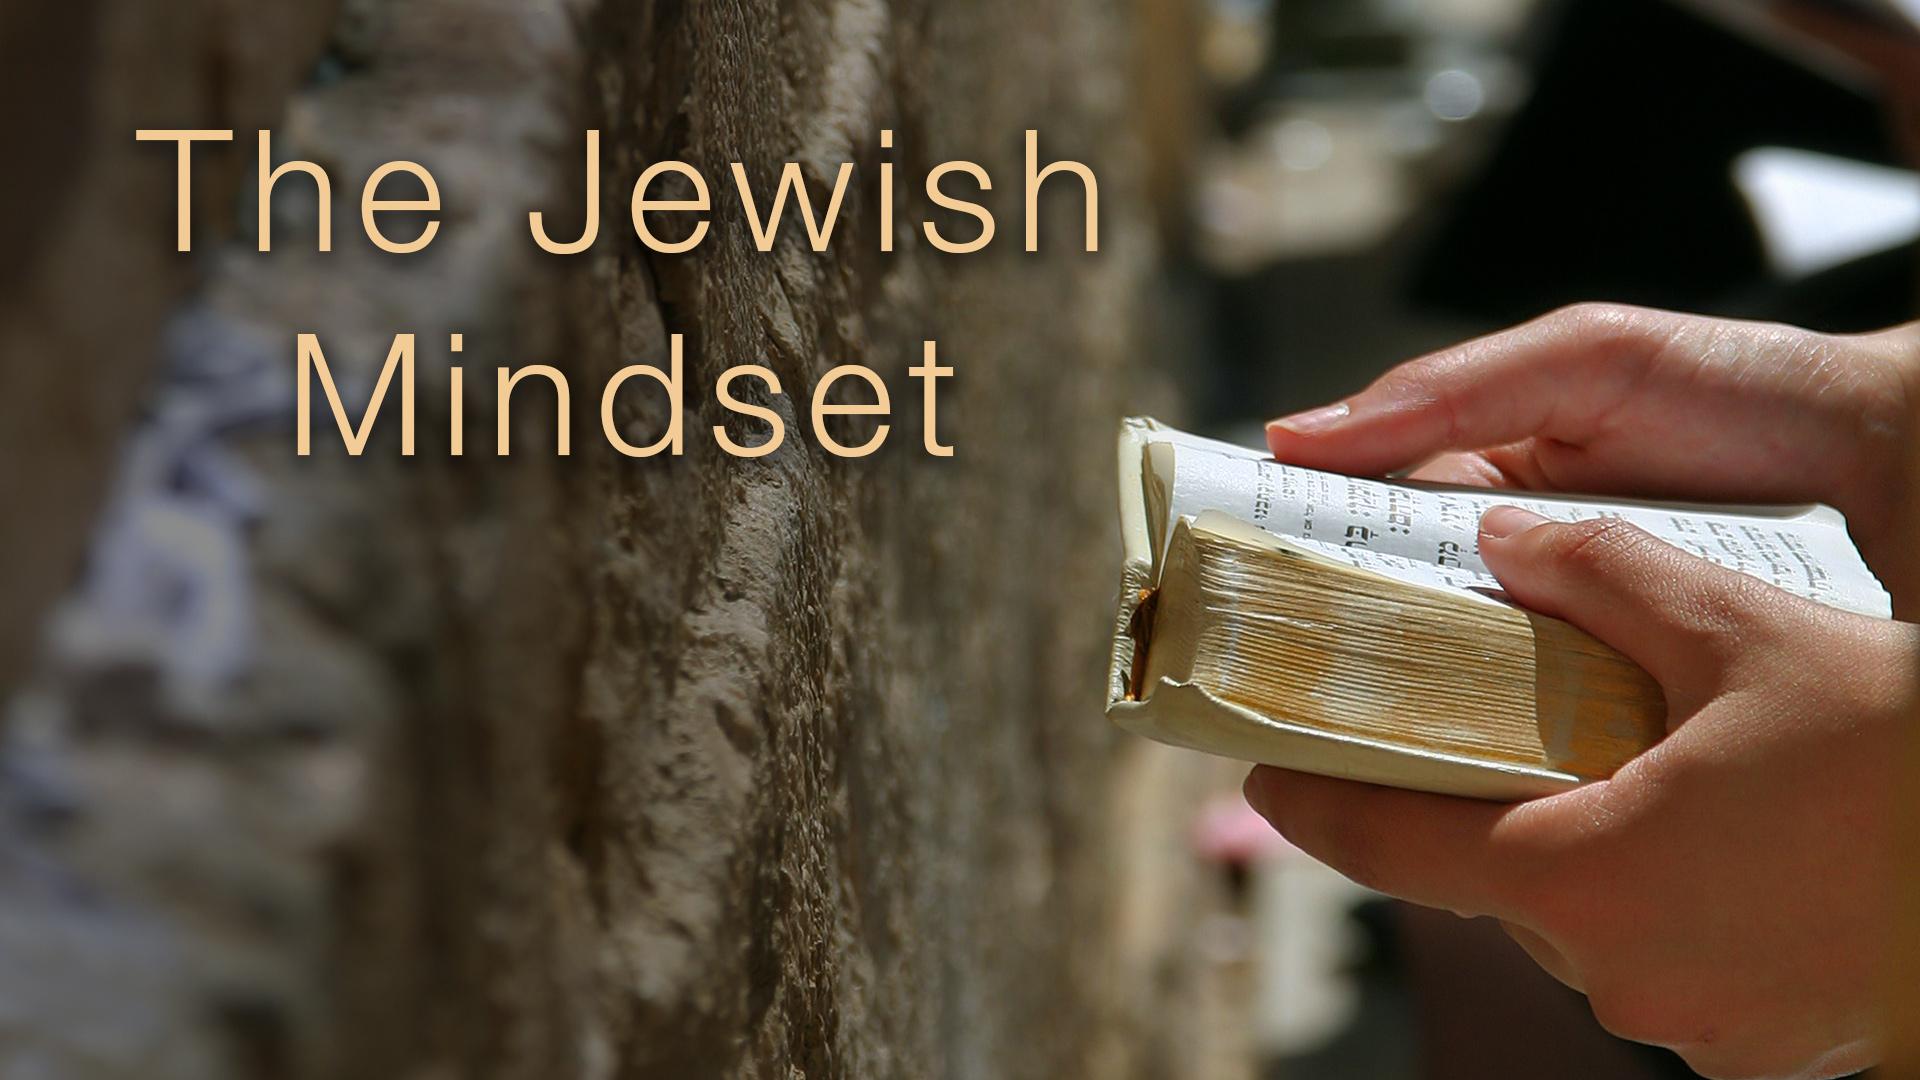 The Jewish Mindset (2013)